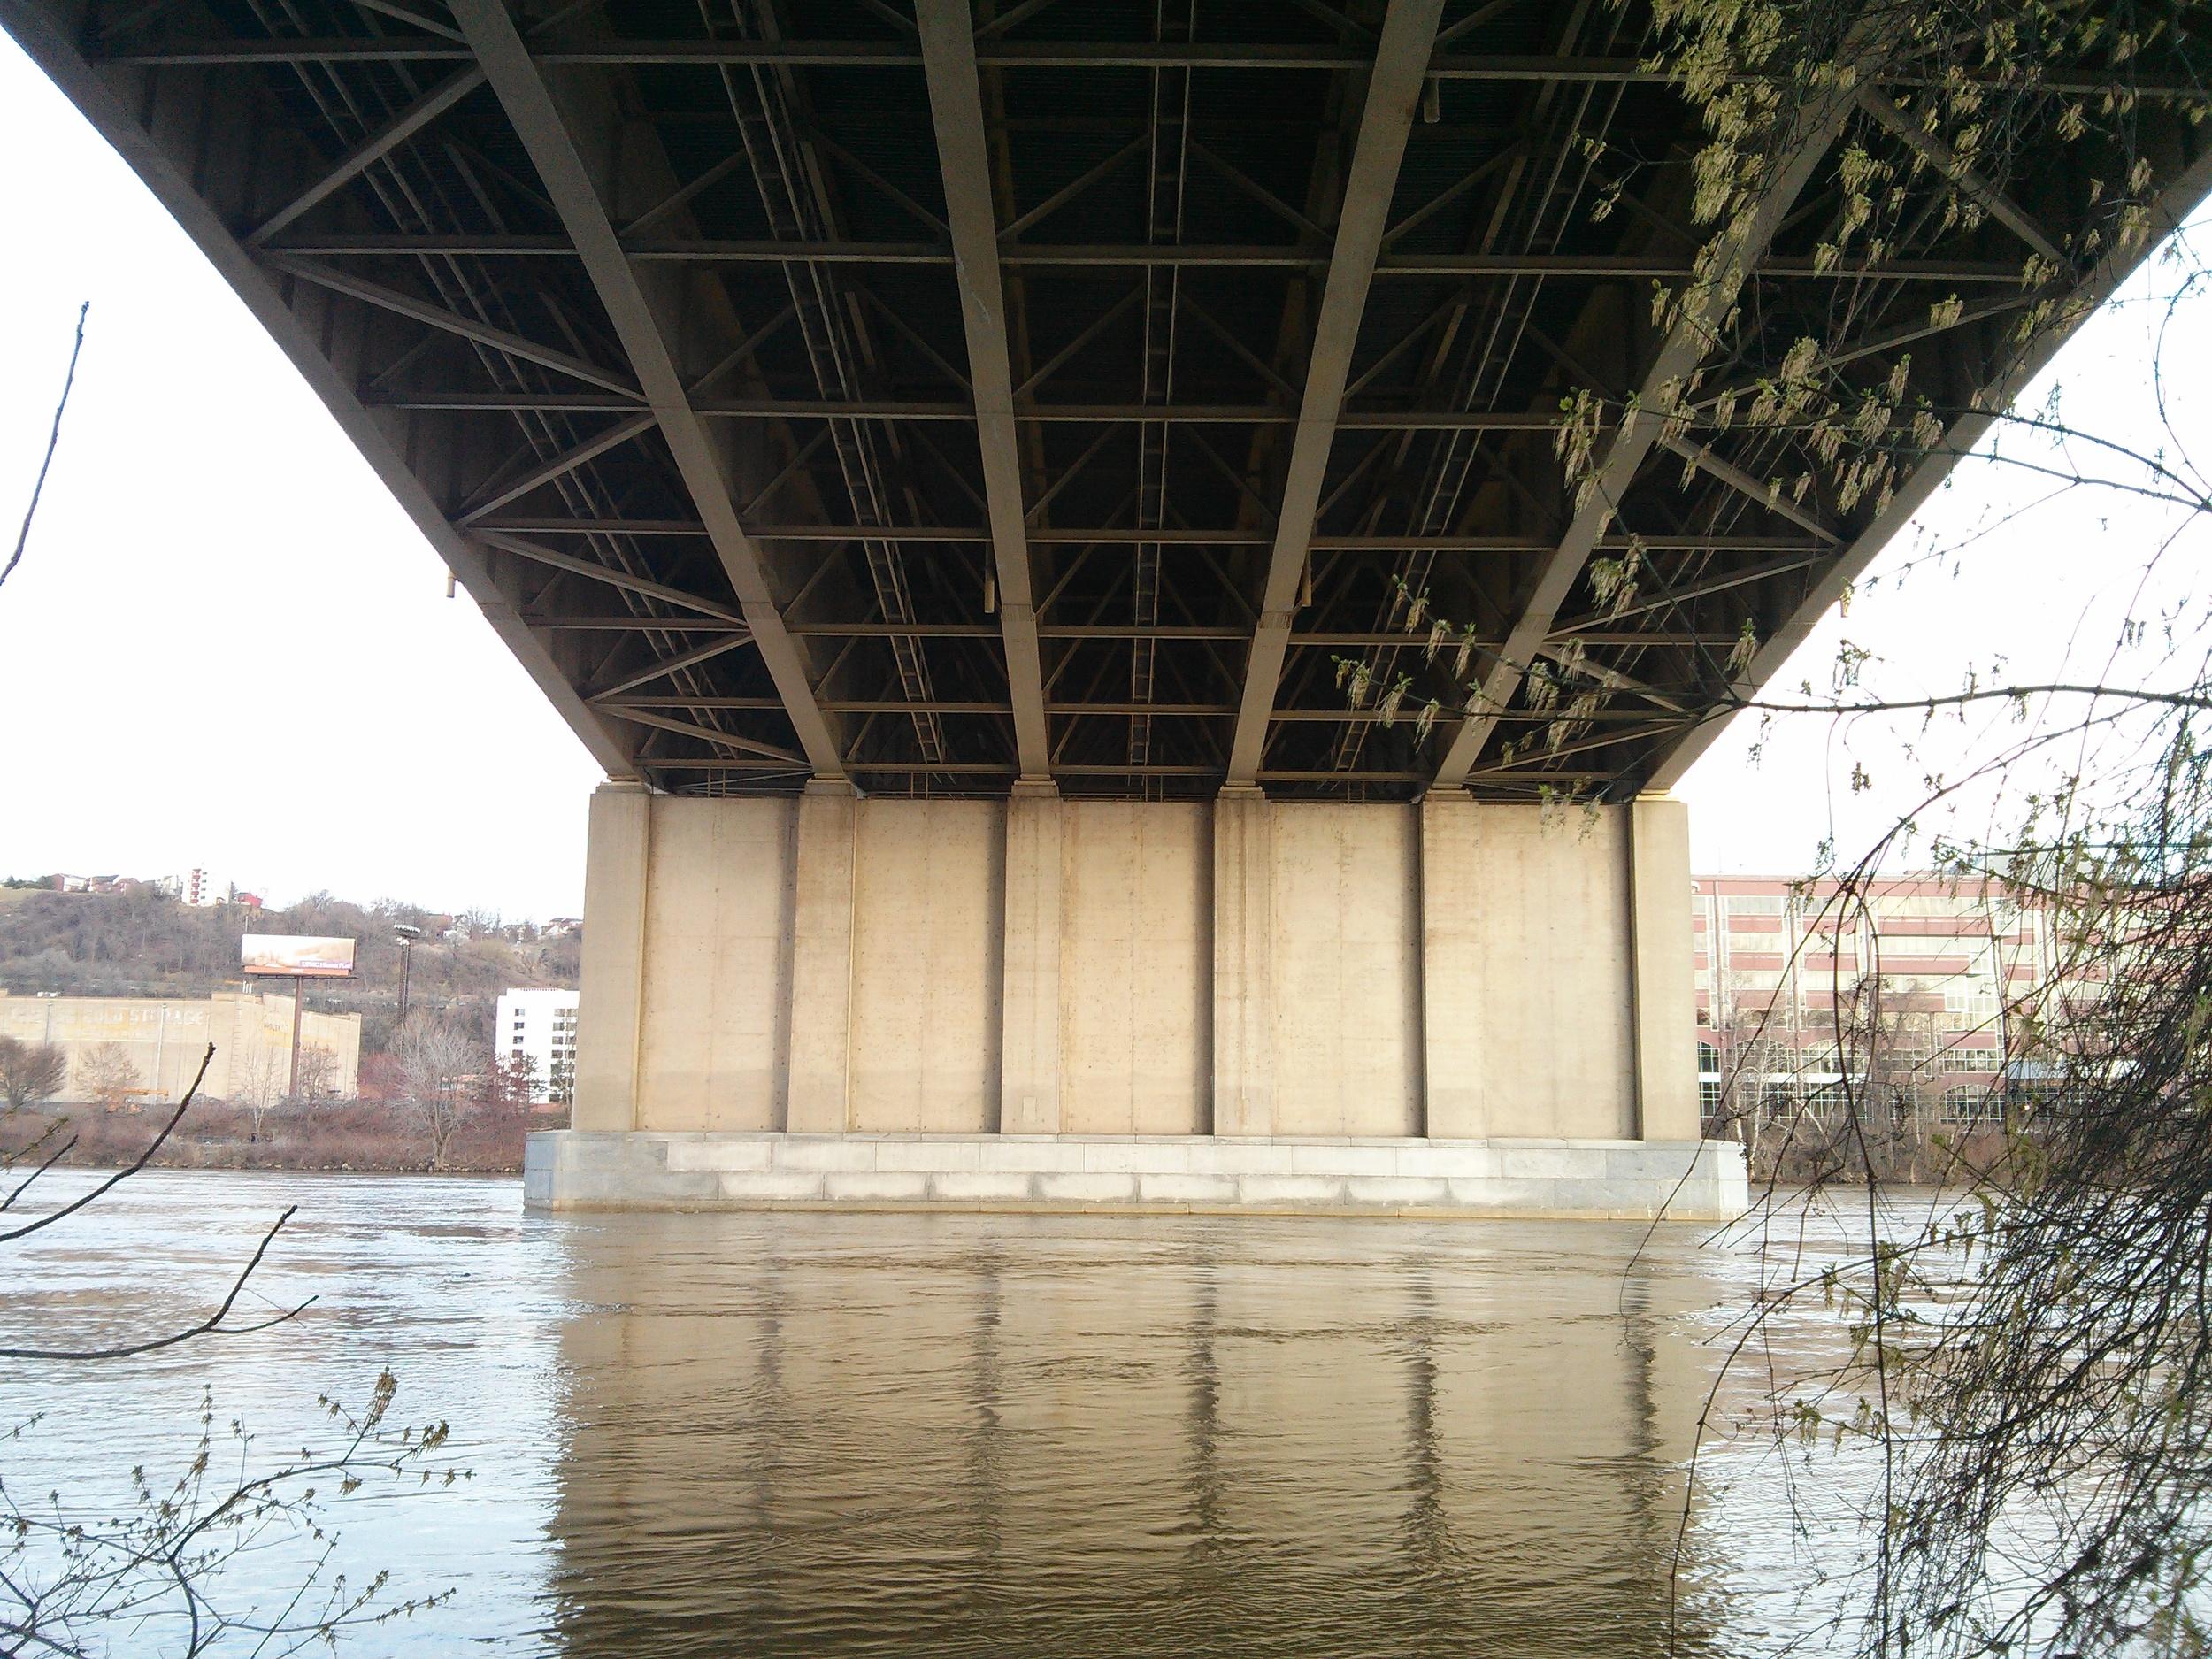 The Veteran's Bridge inPittsburgh, PA, photo bySteve Gurysh